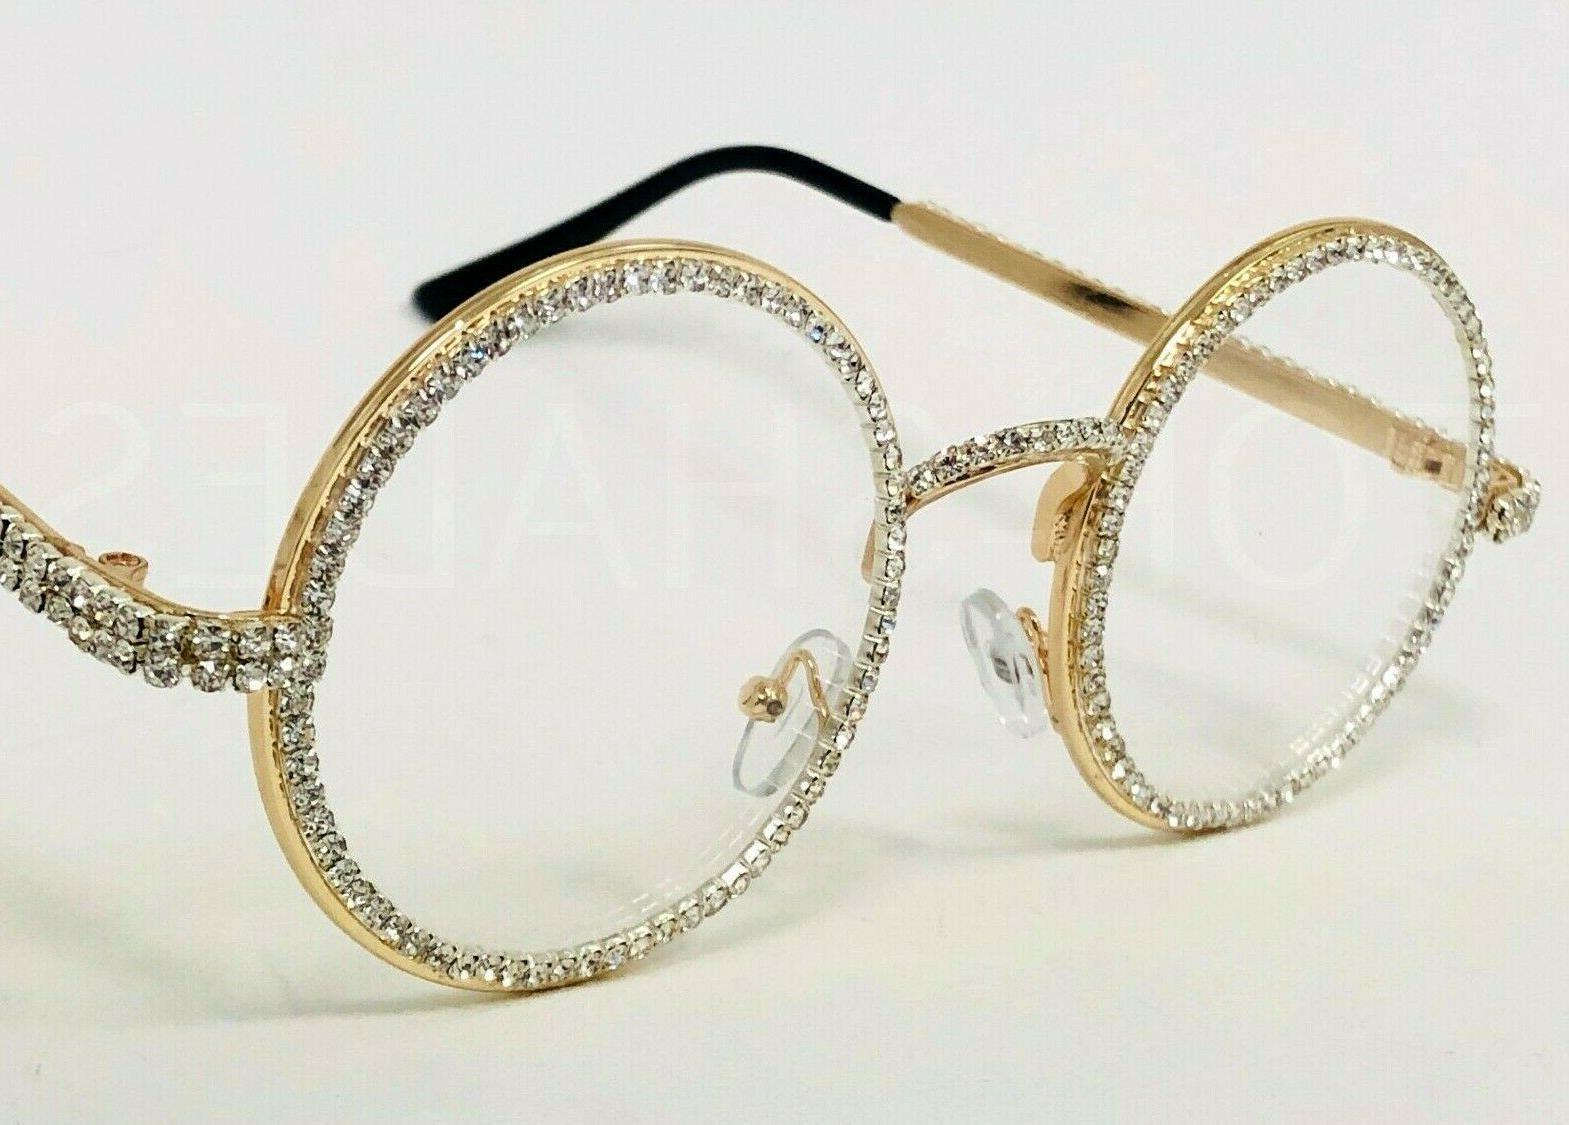 Diamond Bling Gold Metal Round Eye Glasses Sunglasses